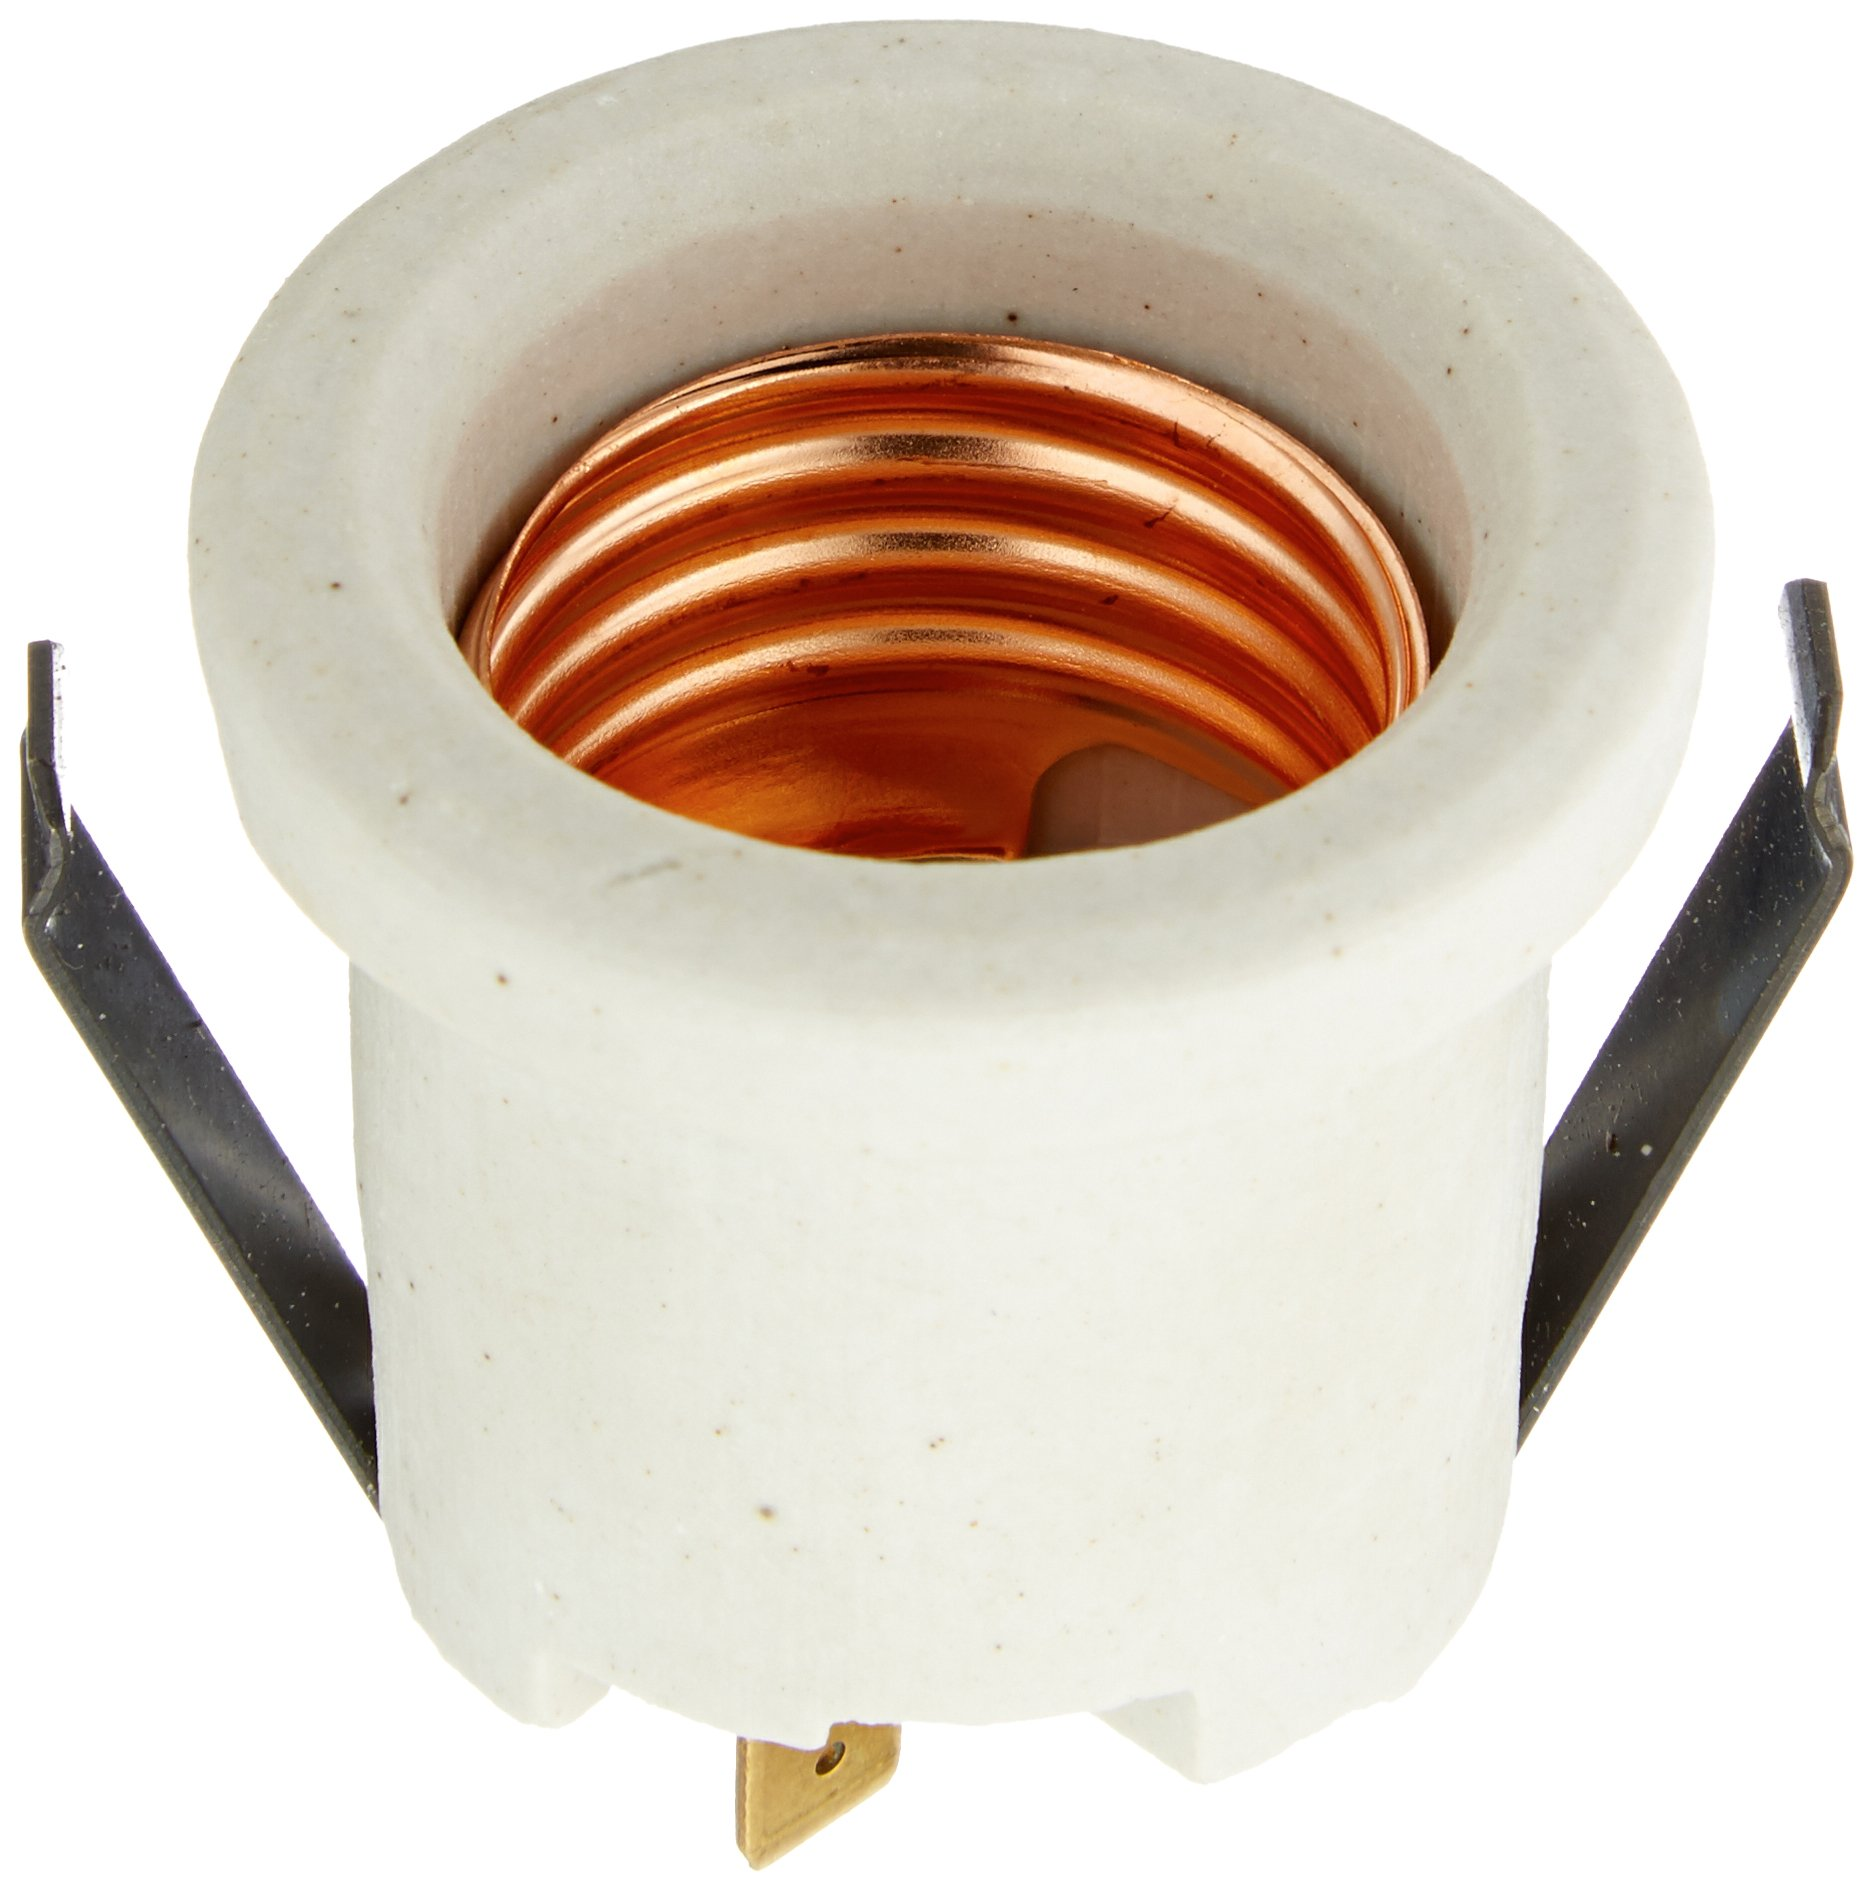 Frigidaire 316116400 Light Socket Range/Stove/Oven